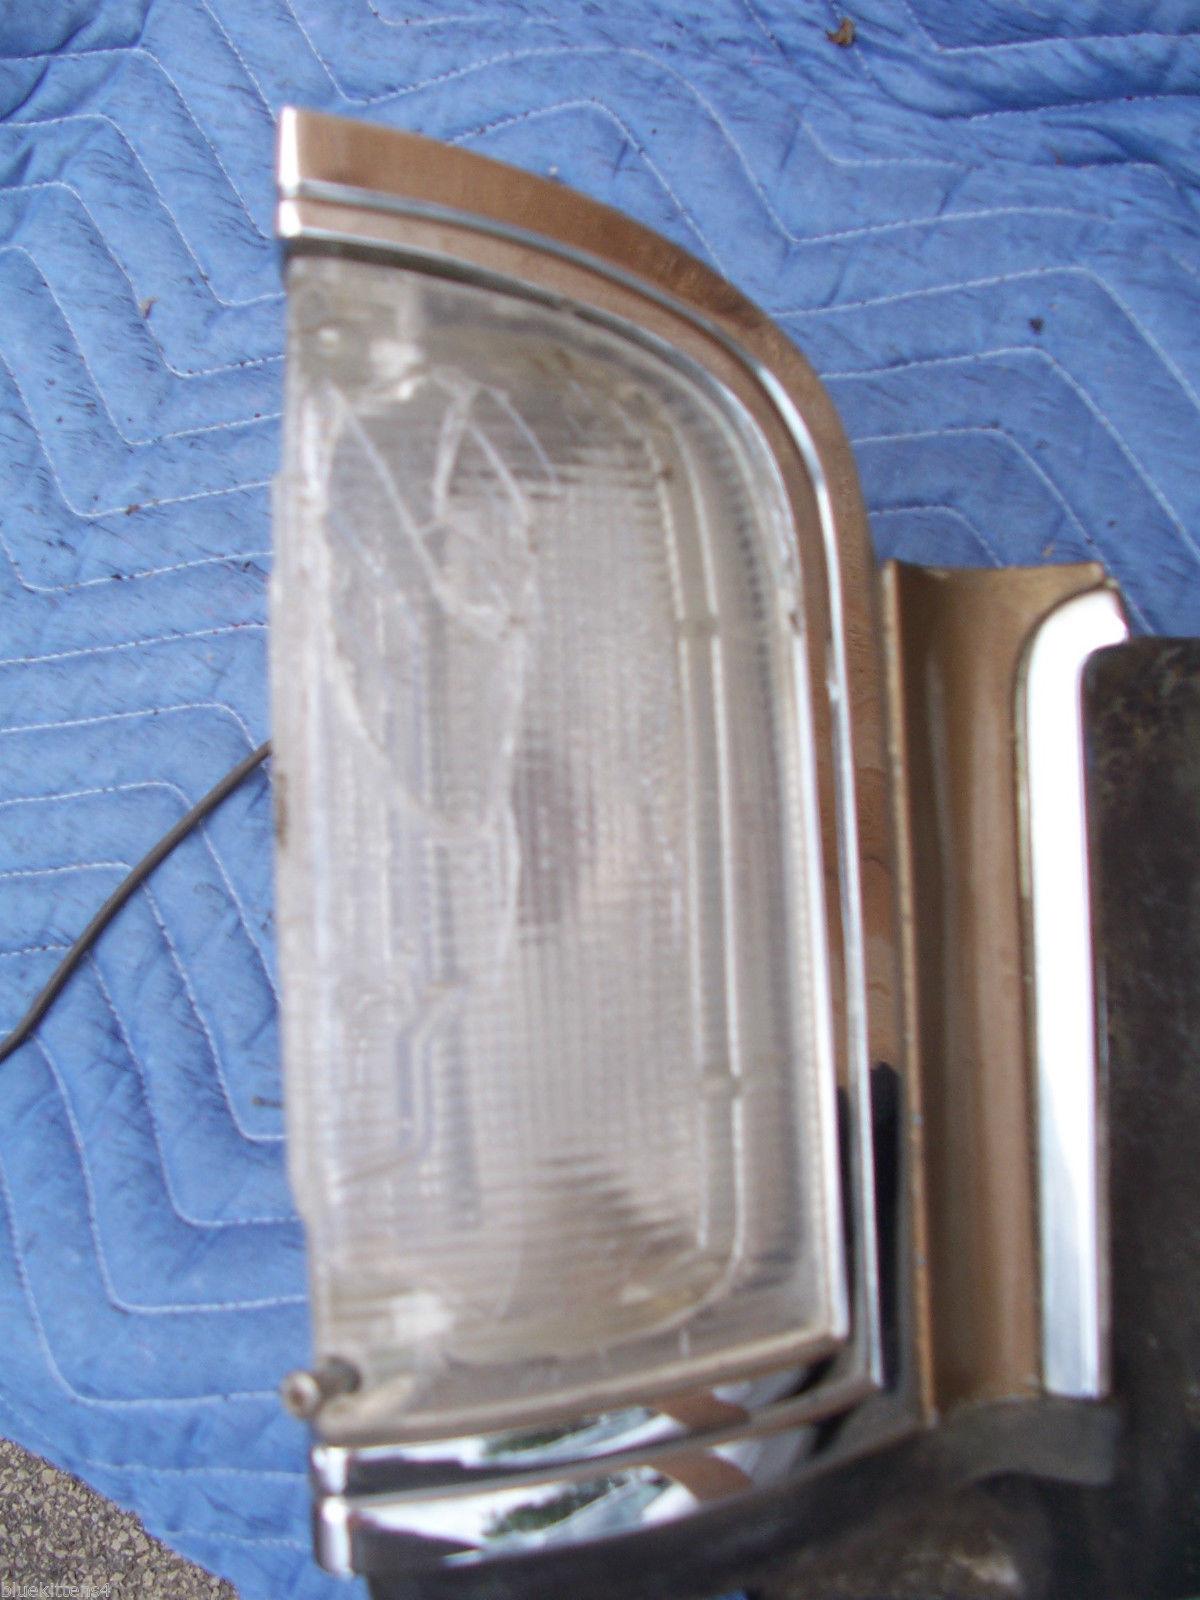 1969 ELDORADO RIGHT MARKER LIGHT CRACKED BROKEN SEE PHOTOS OEM USED CADILLAC image 2